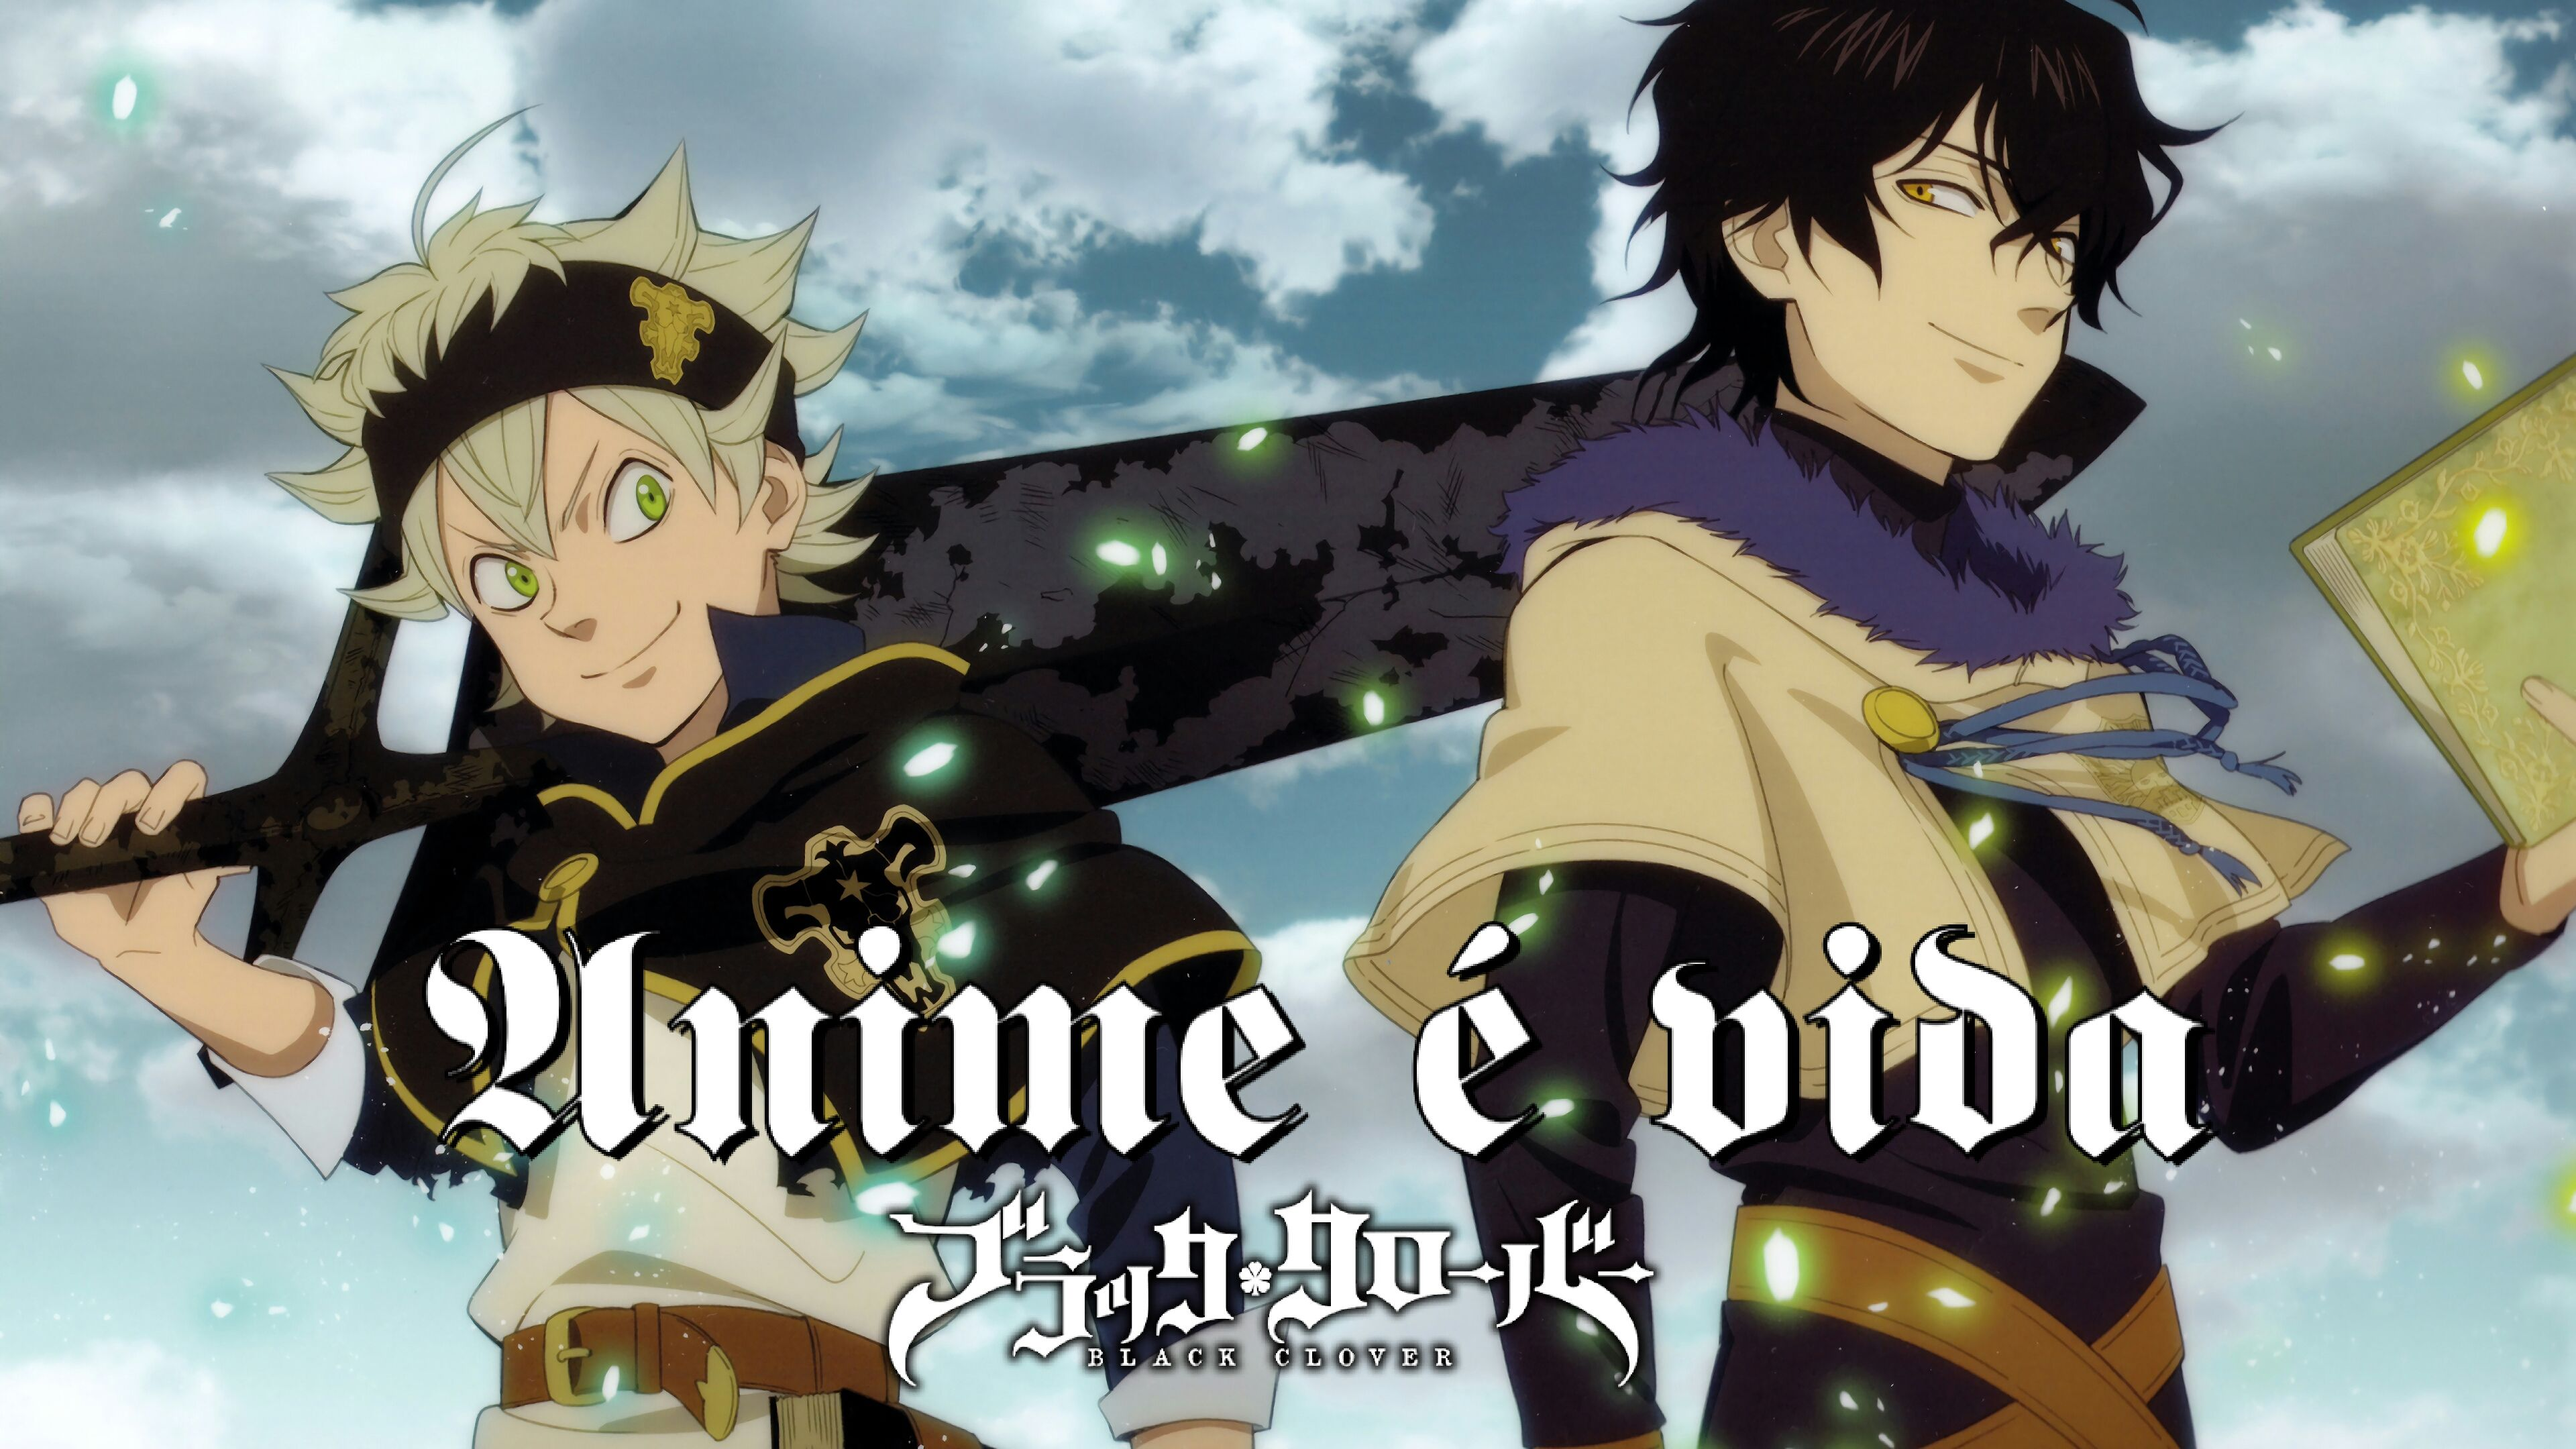 Top Black clover anime, Black clover manga, Anime